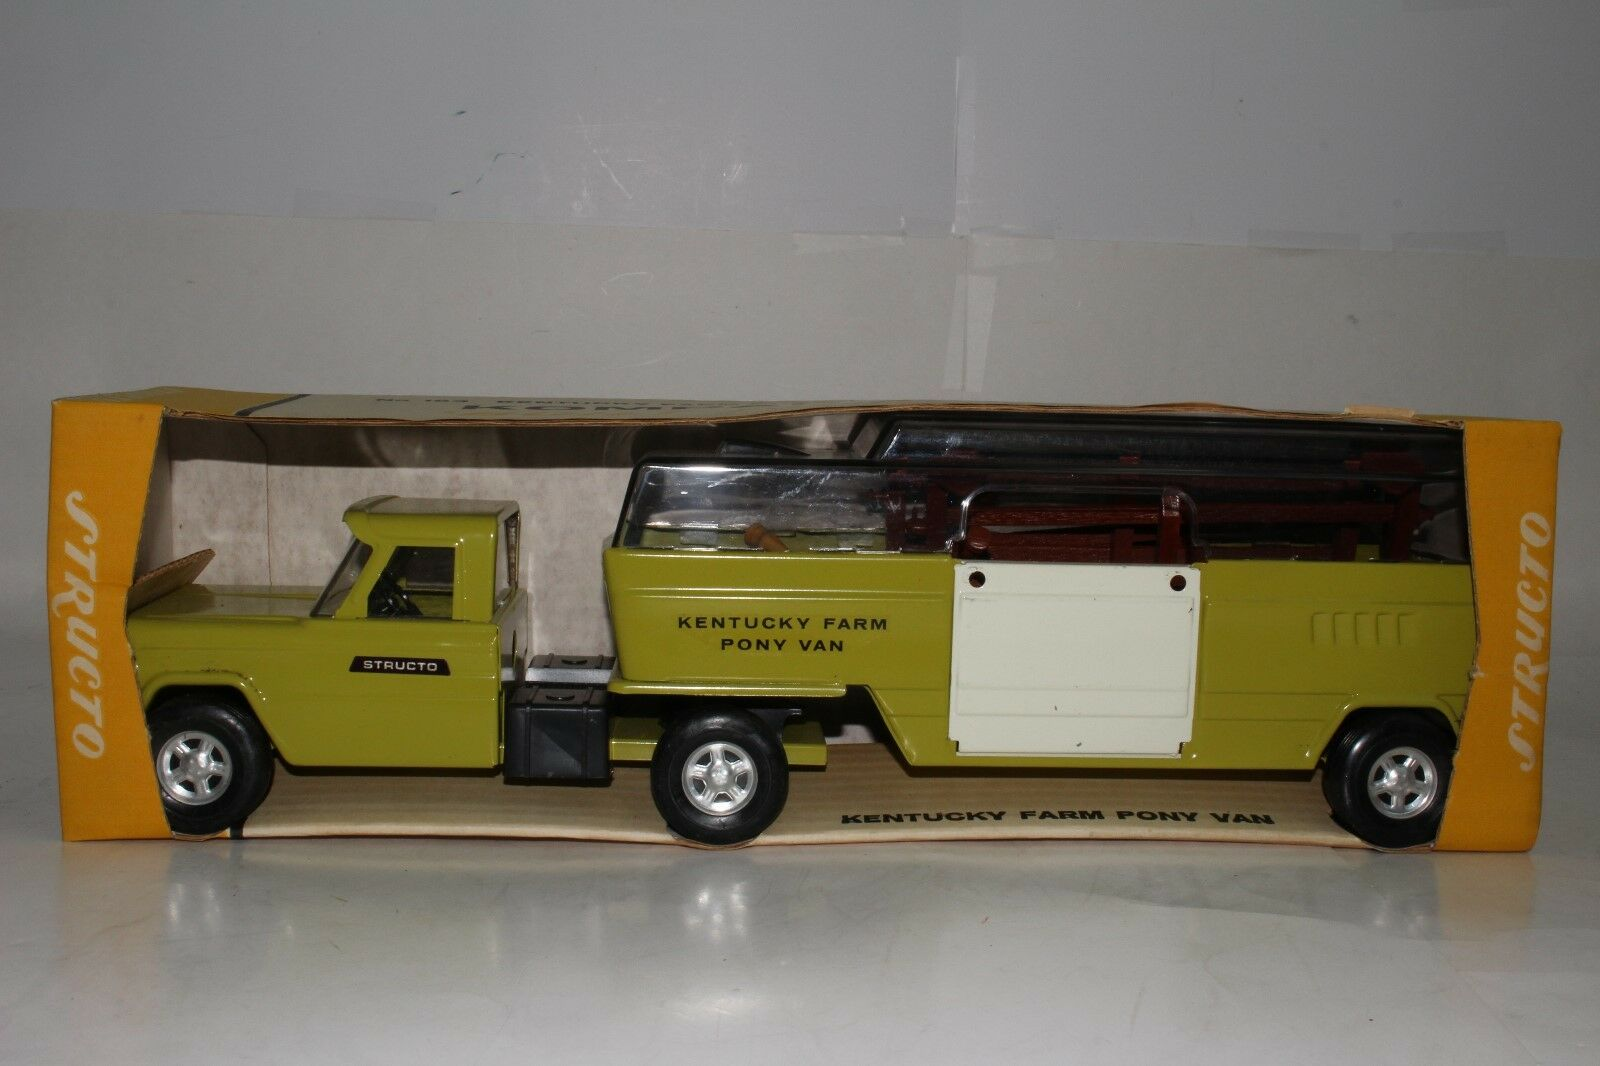 597ms Structo Kentucky Caballo Granja Semi Camión con Caja y Accesorios,